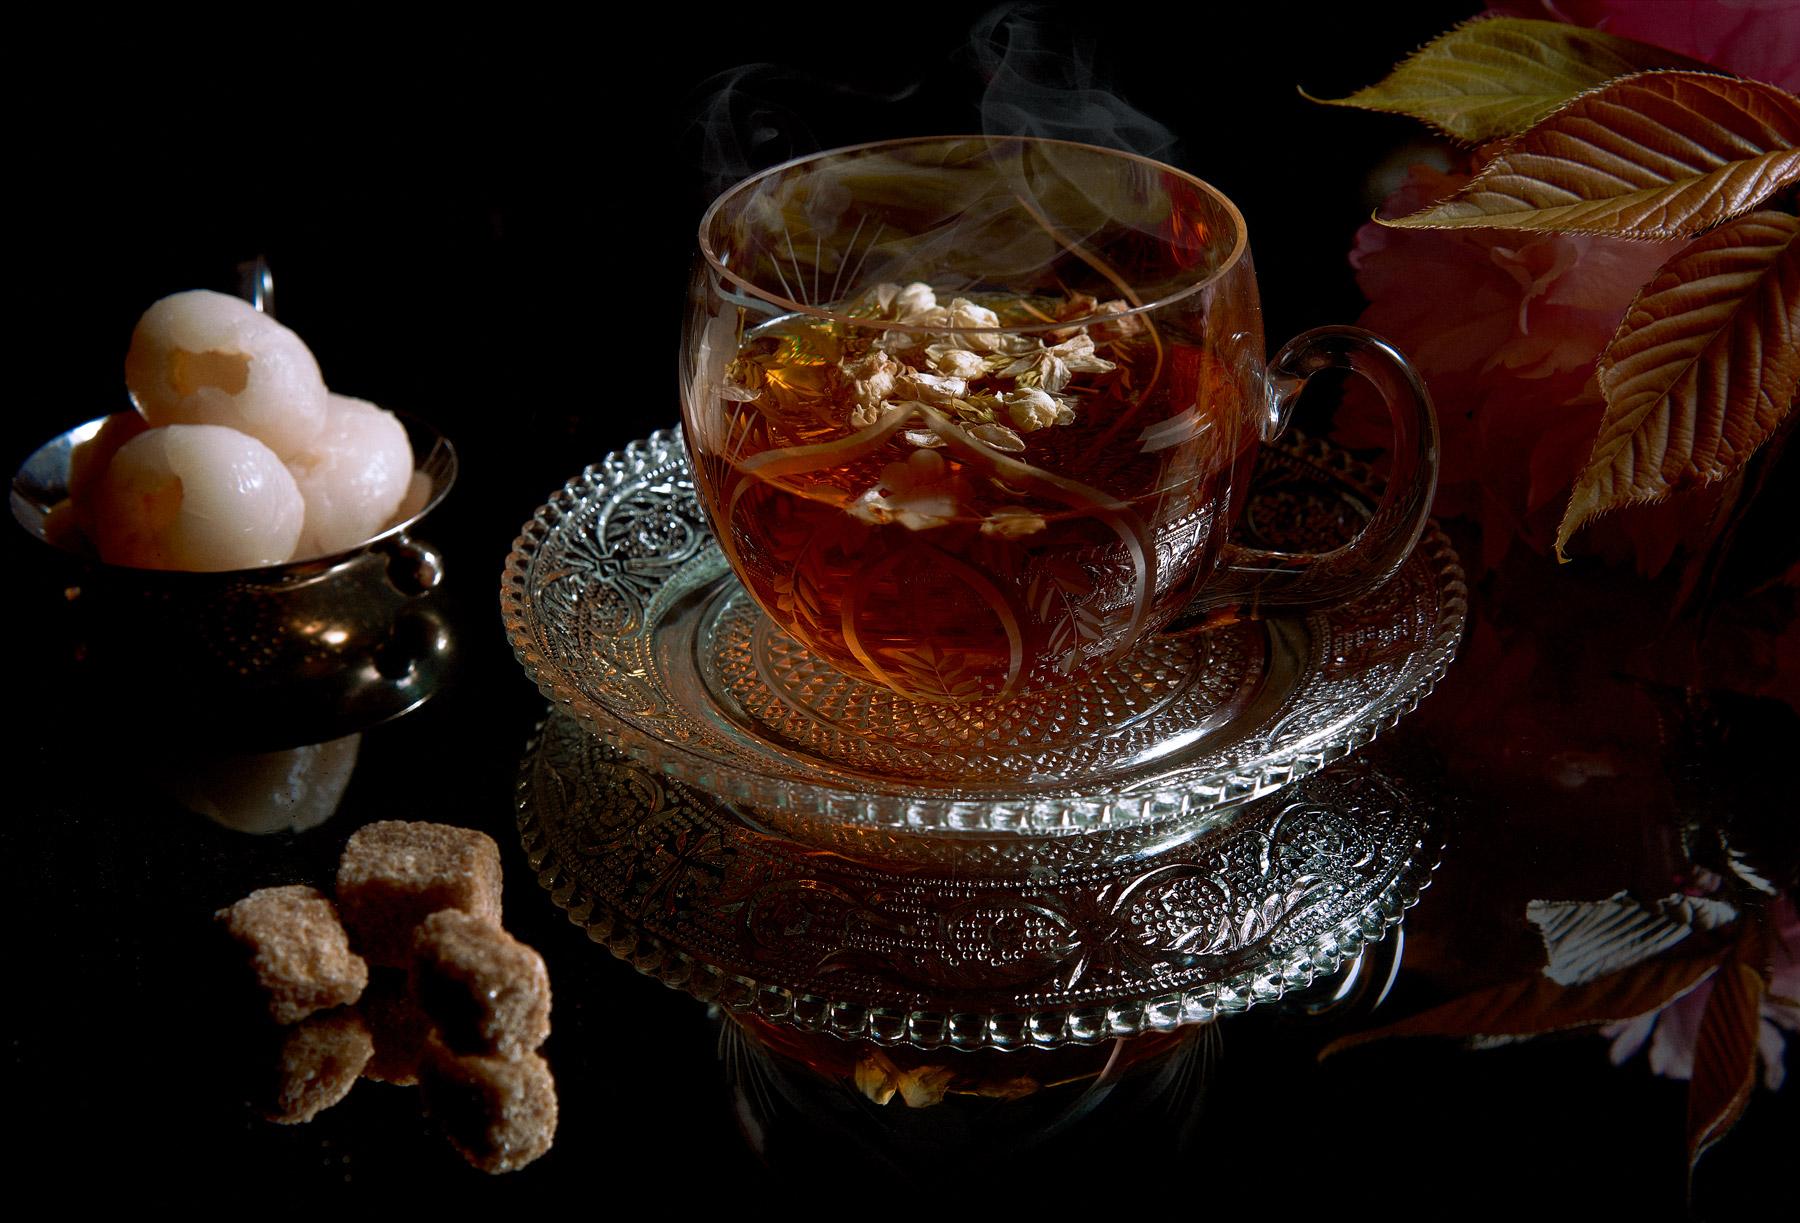 herboristerie-tisanes-the-herboriste-tournai-infusion-bubble-tea-tapioca-lichi-fleurs-photographe-roiboos-ath